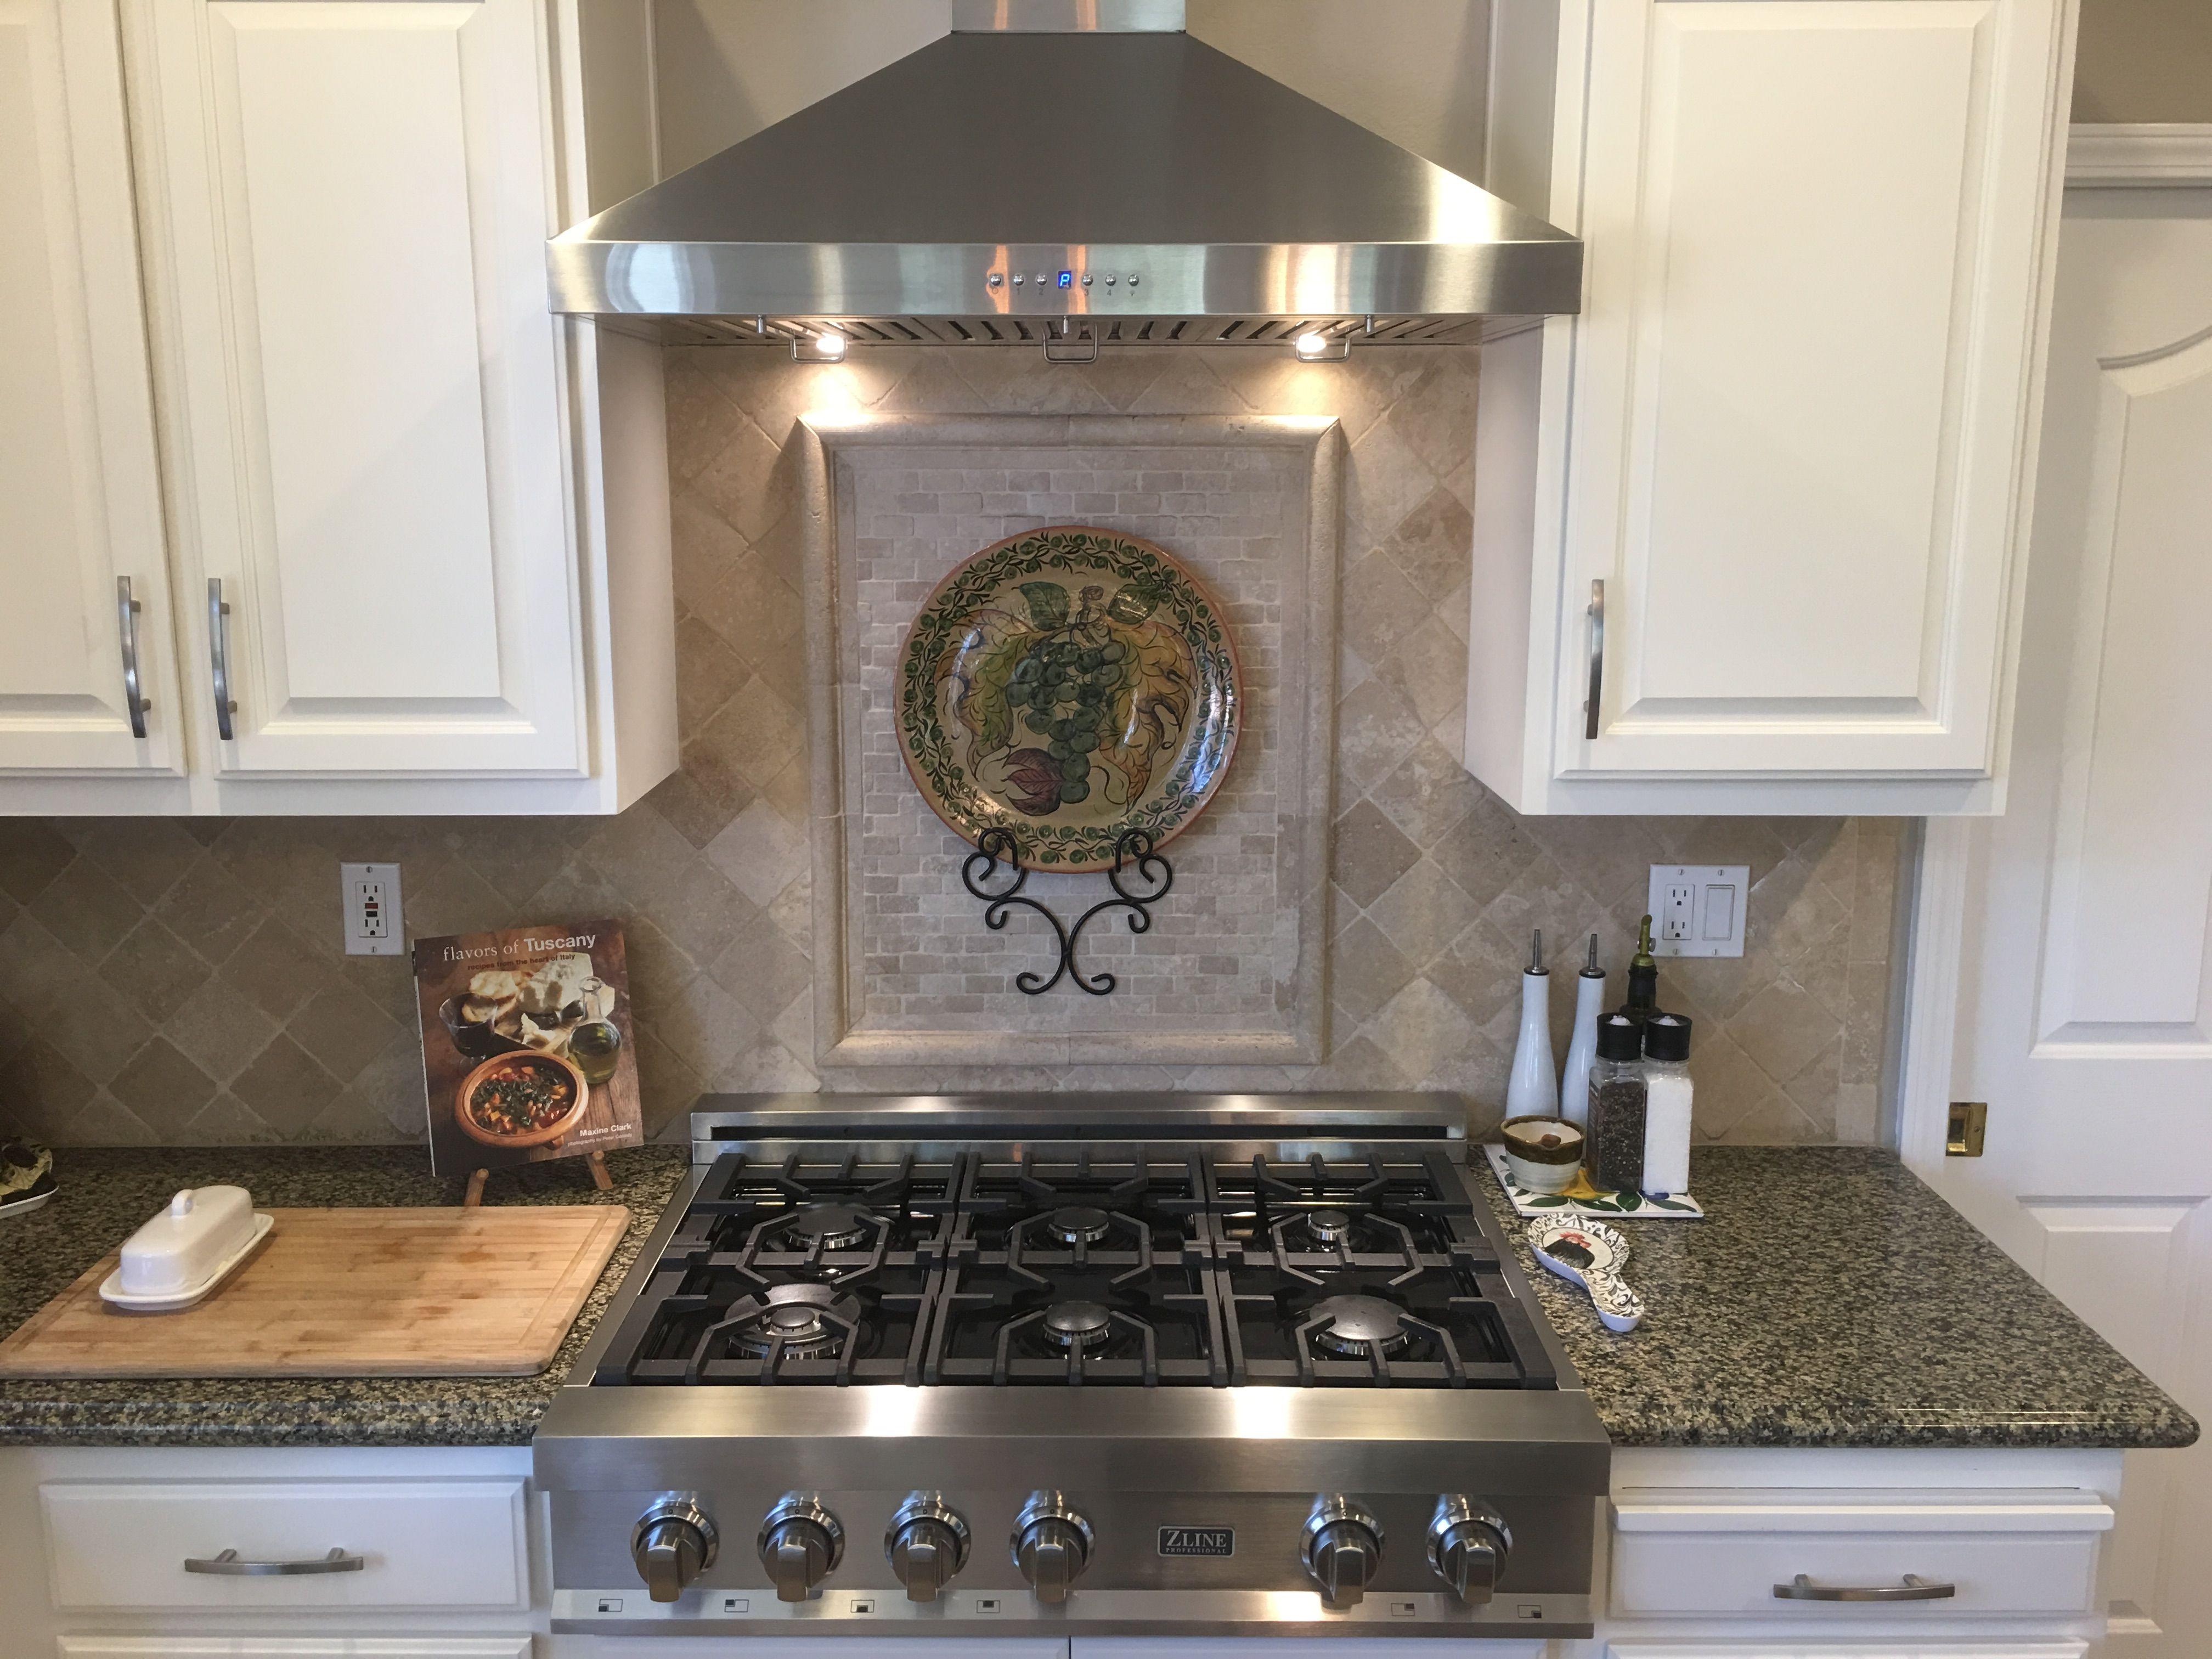 Zline 36 In Porcelain Rangetop With 6 Gas Burners Rt36 Kitchen Ventilation Kitchen Cooking Range